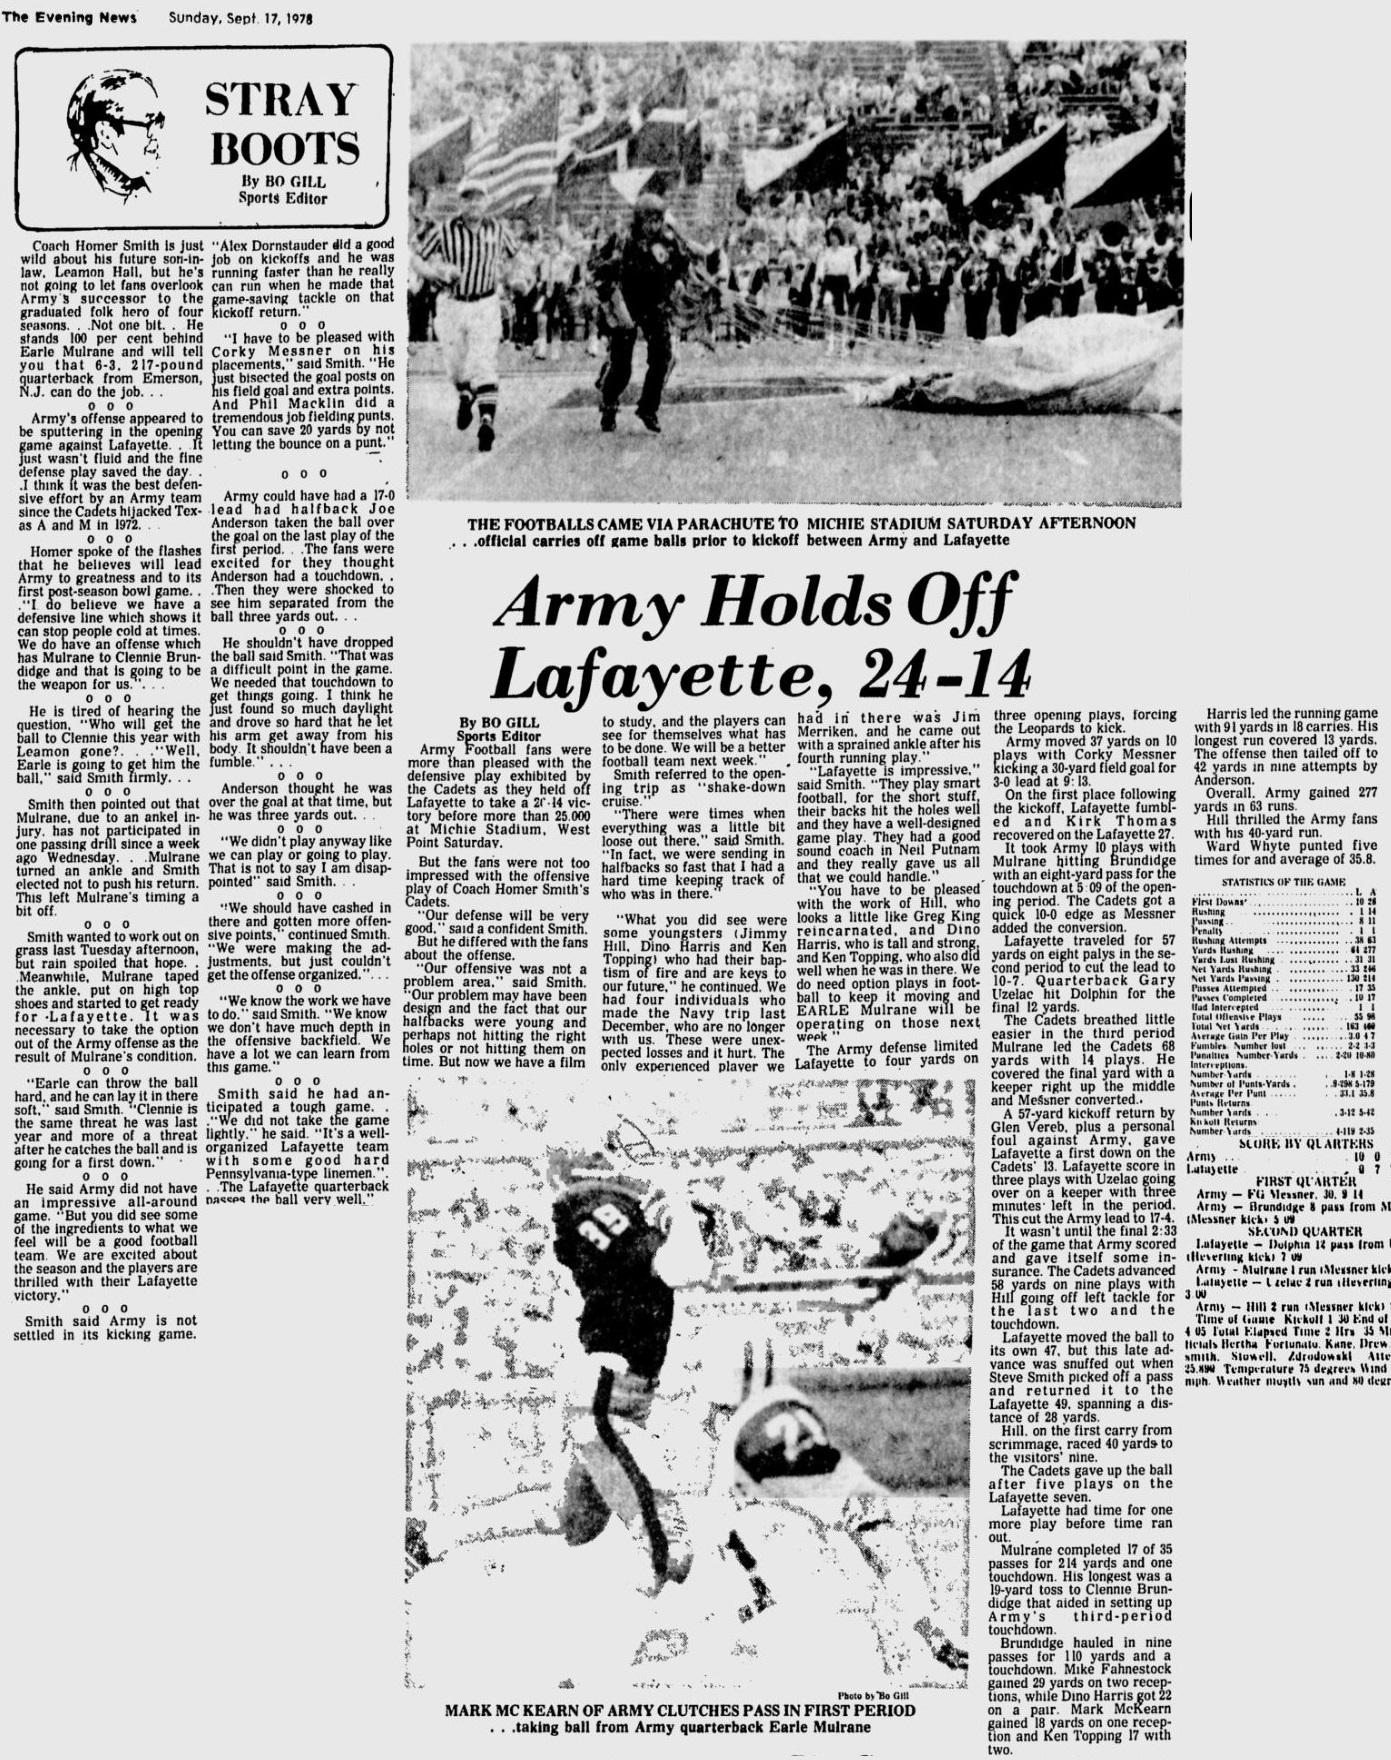 ArmyFB_1978_vsLafayette_EveningNews_Sep171978